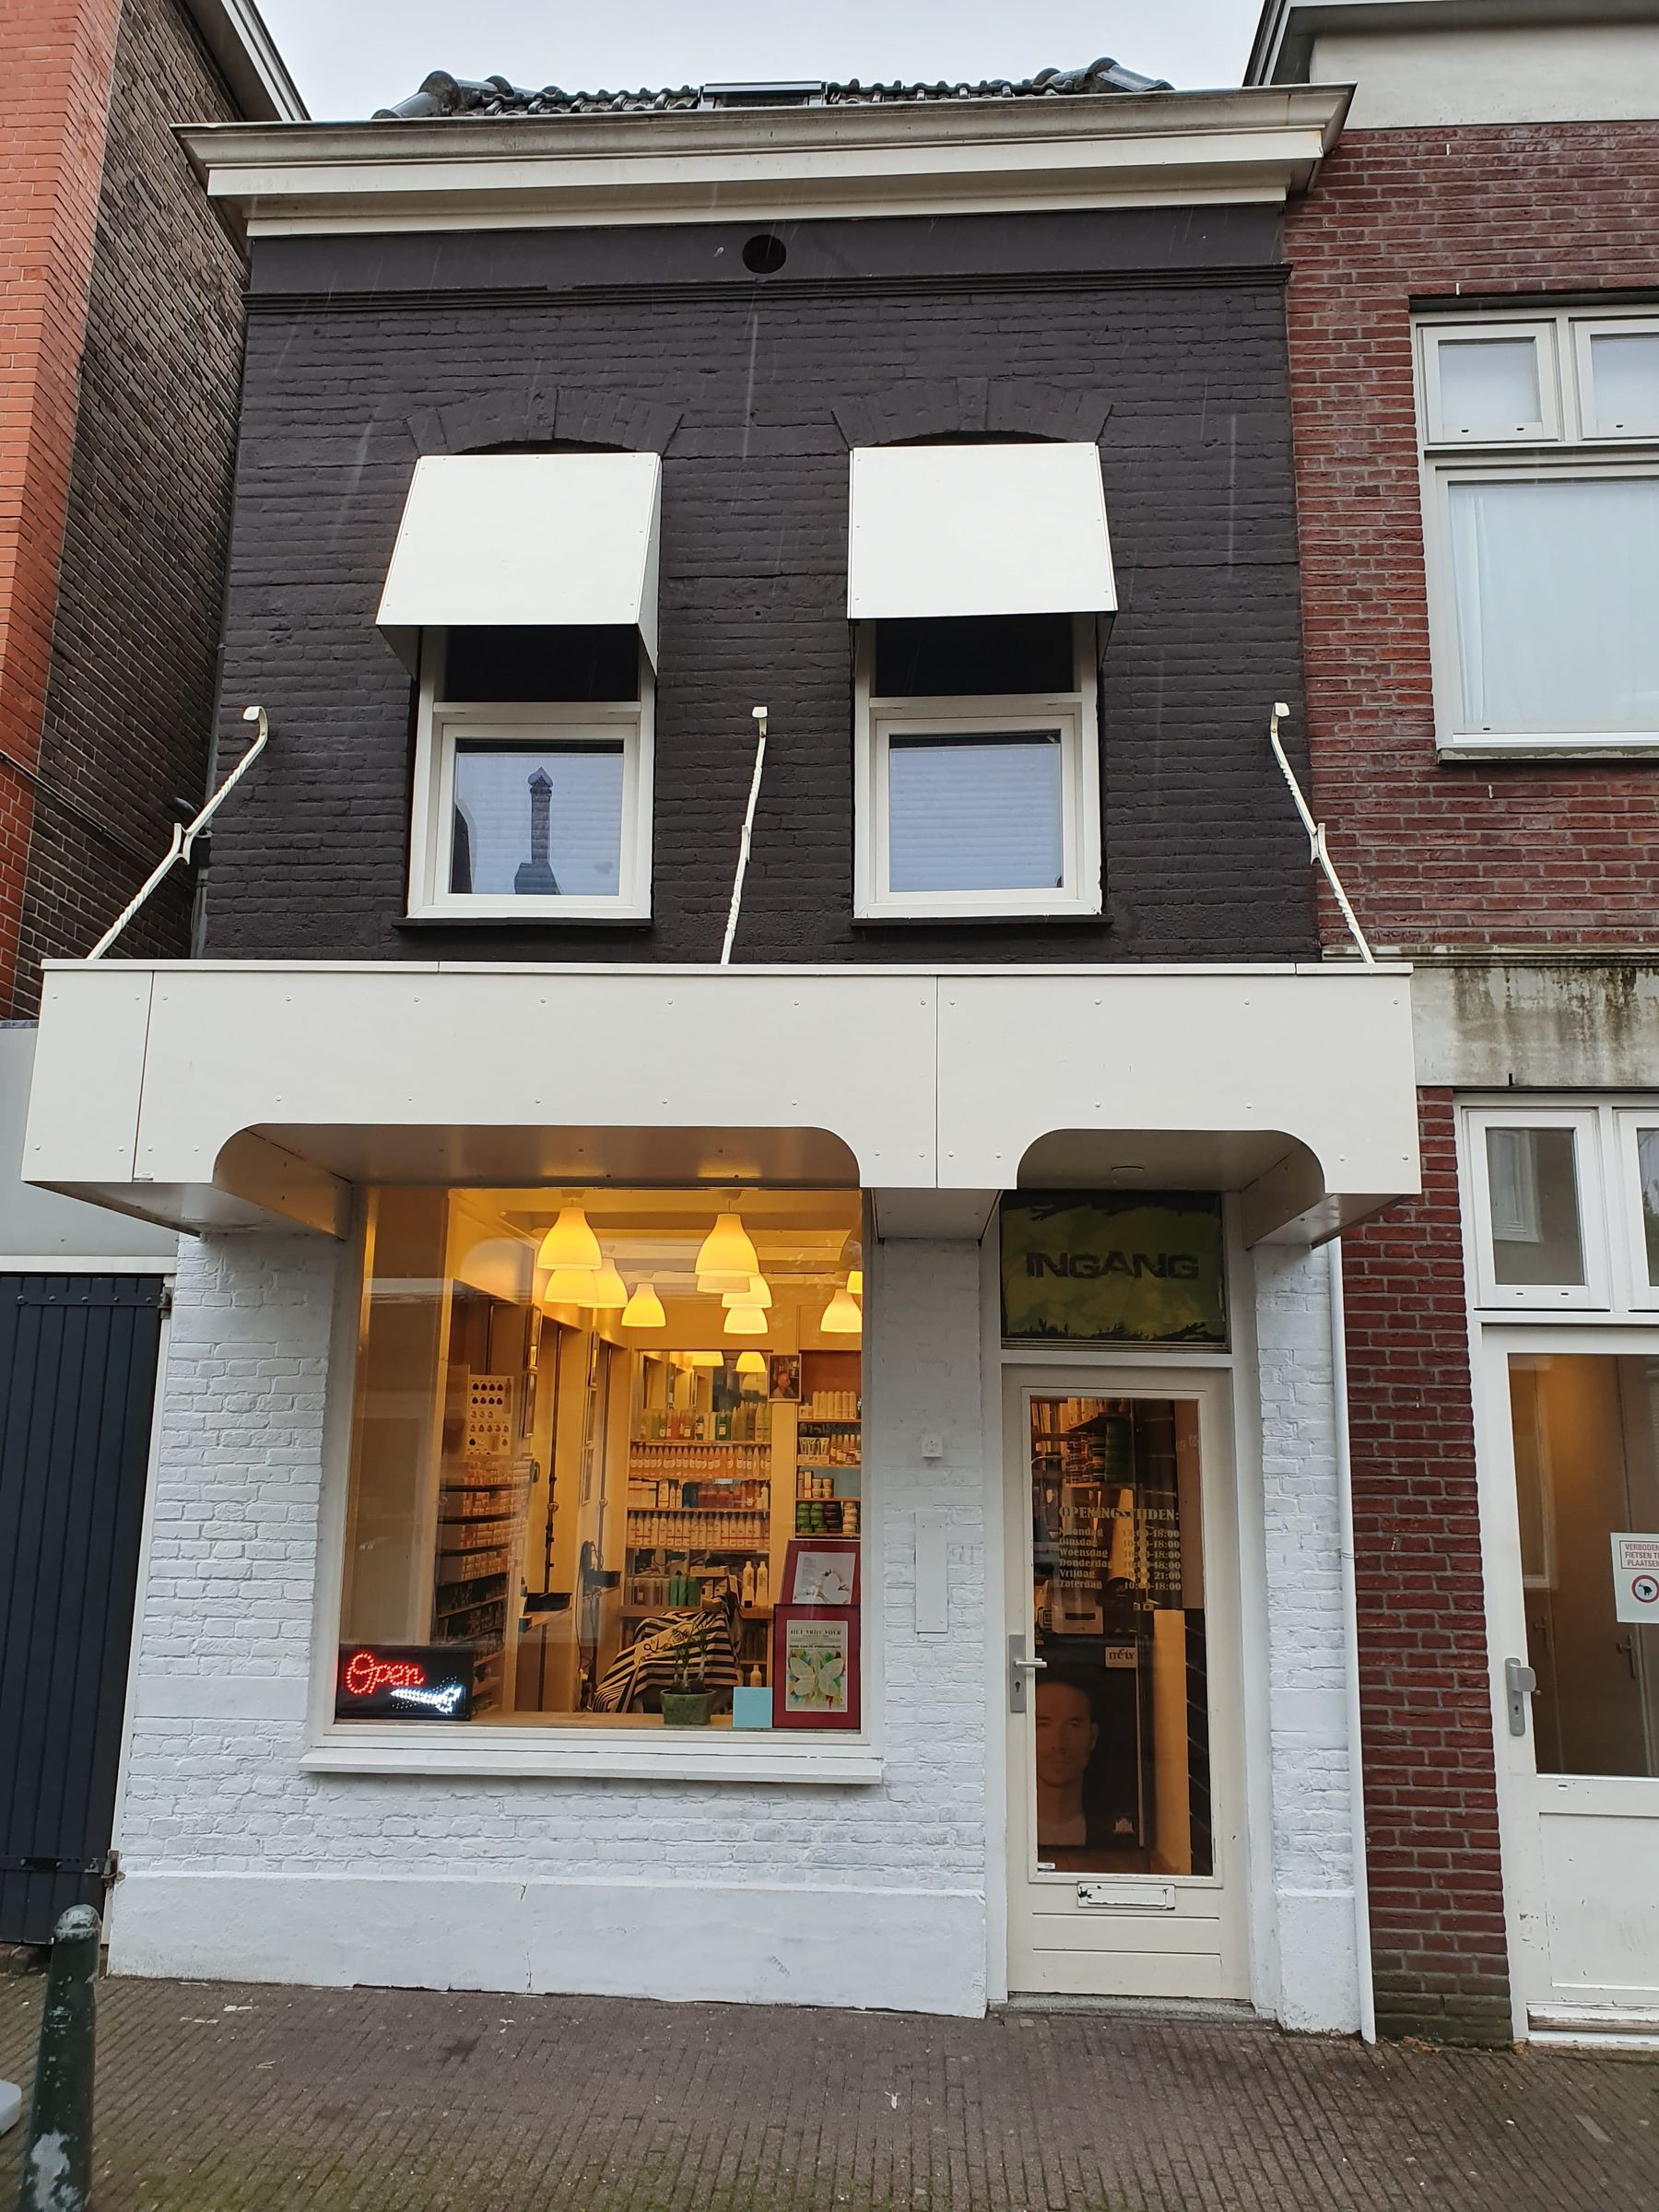 Blauwstraat 52, Steenbergen